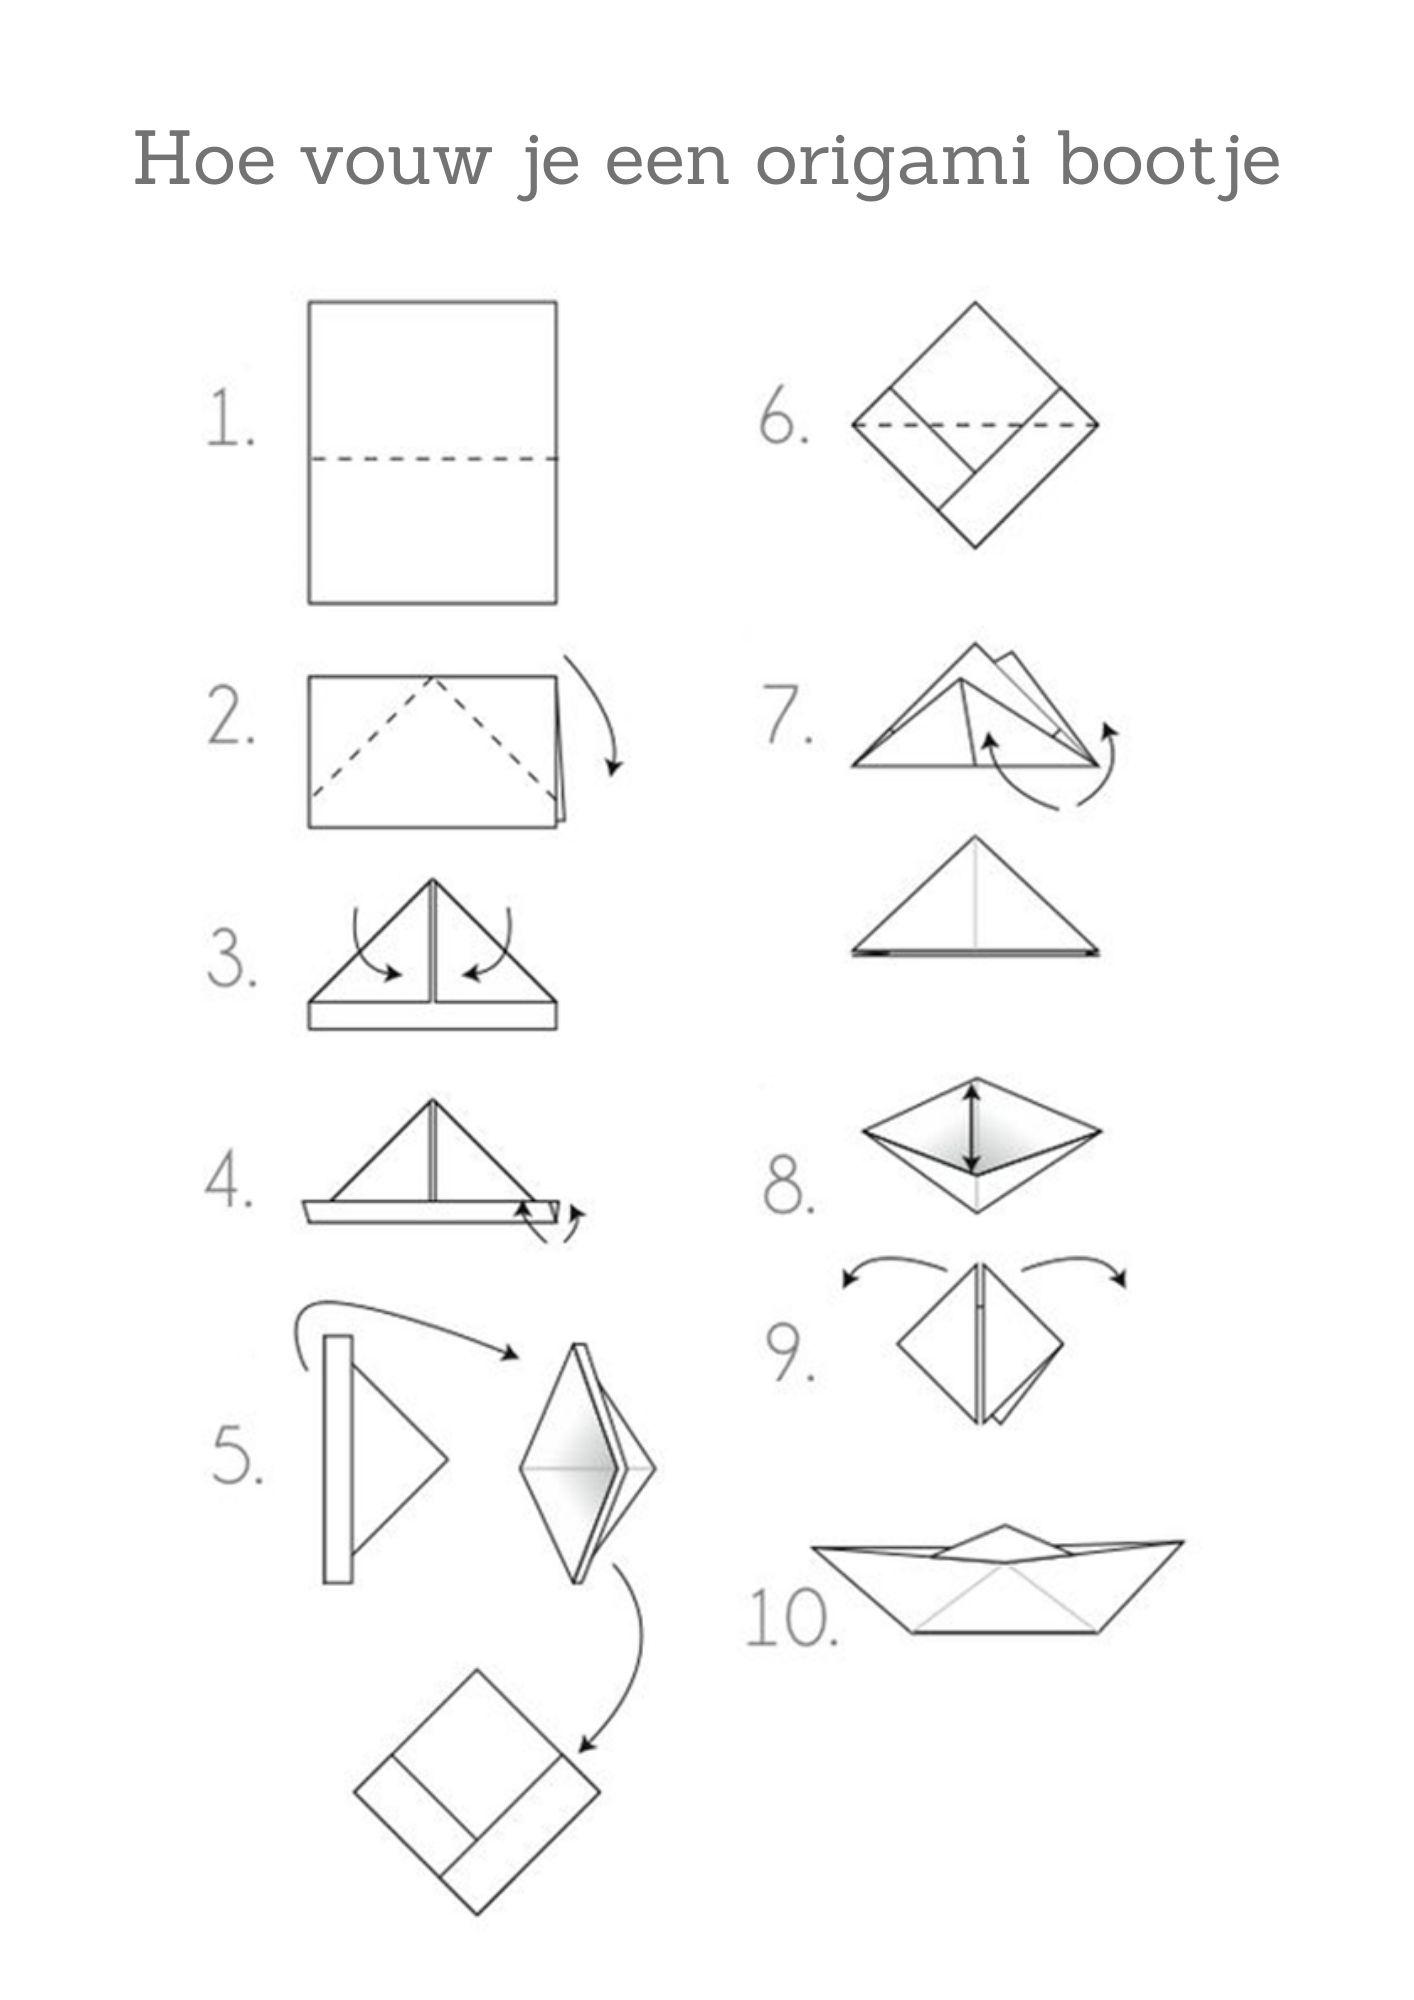 Origami bootje vouwen